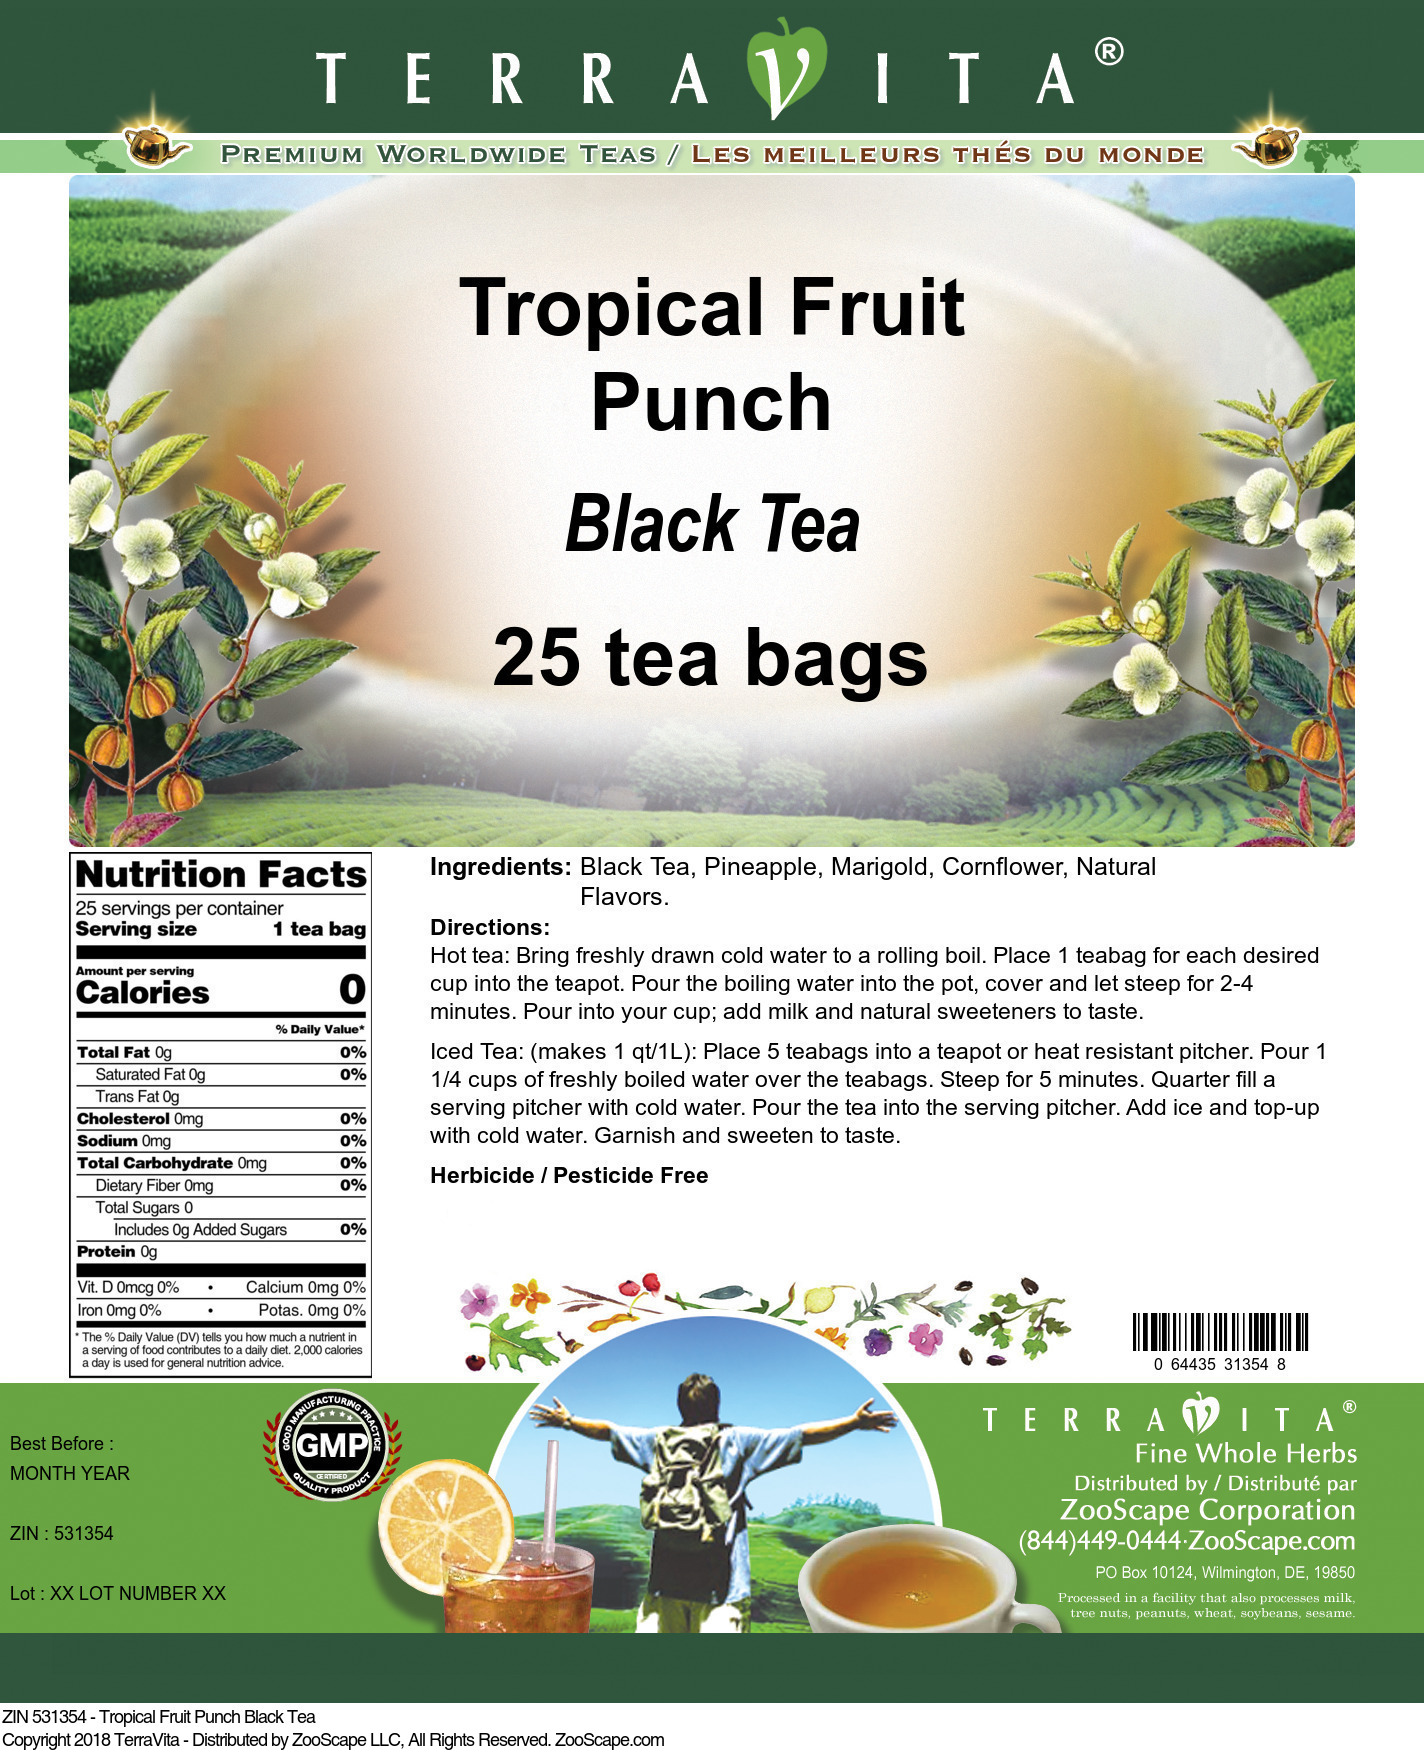 Tropical Fruit Punch Black Tea